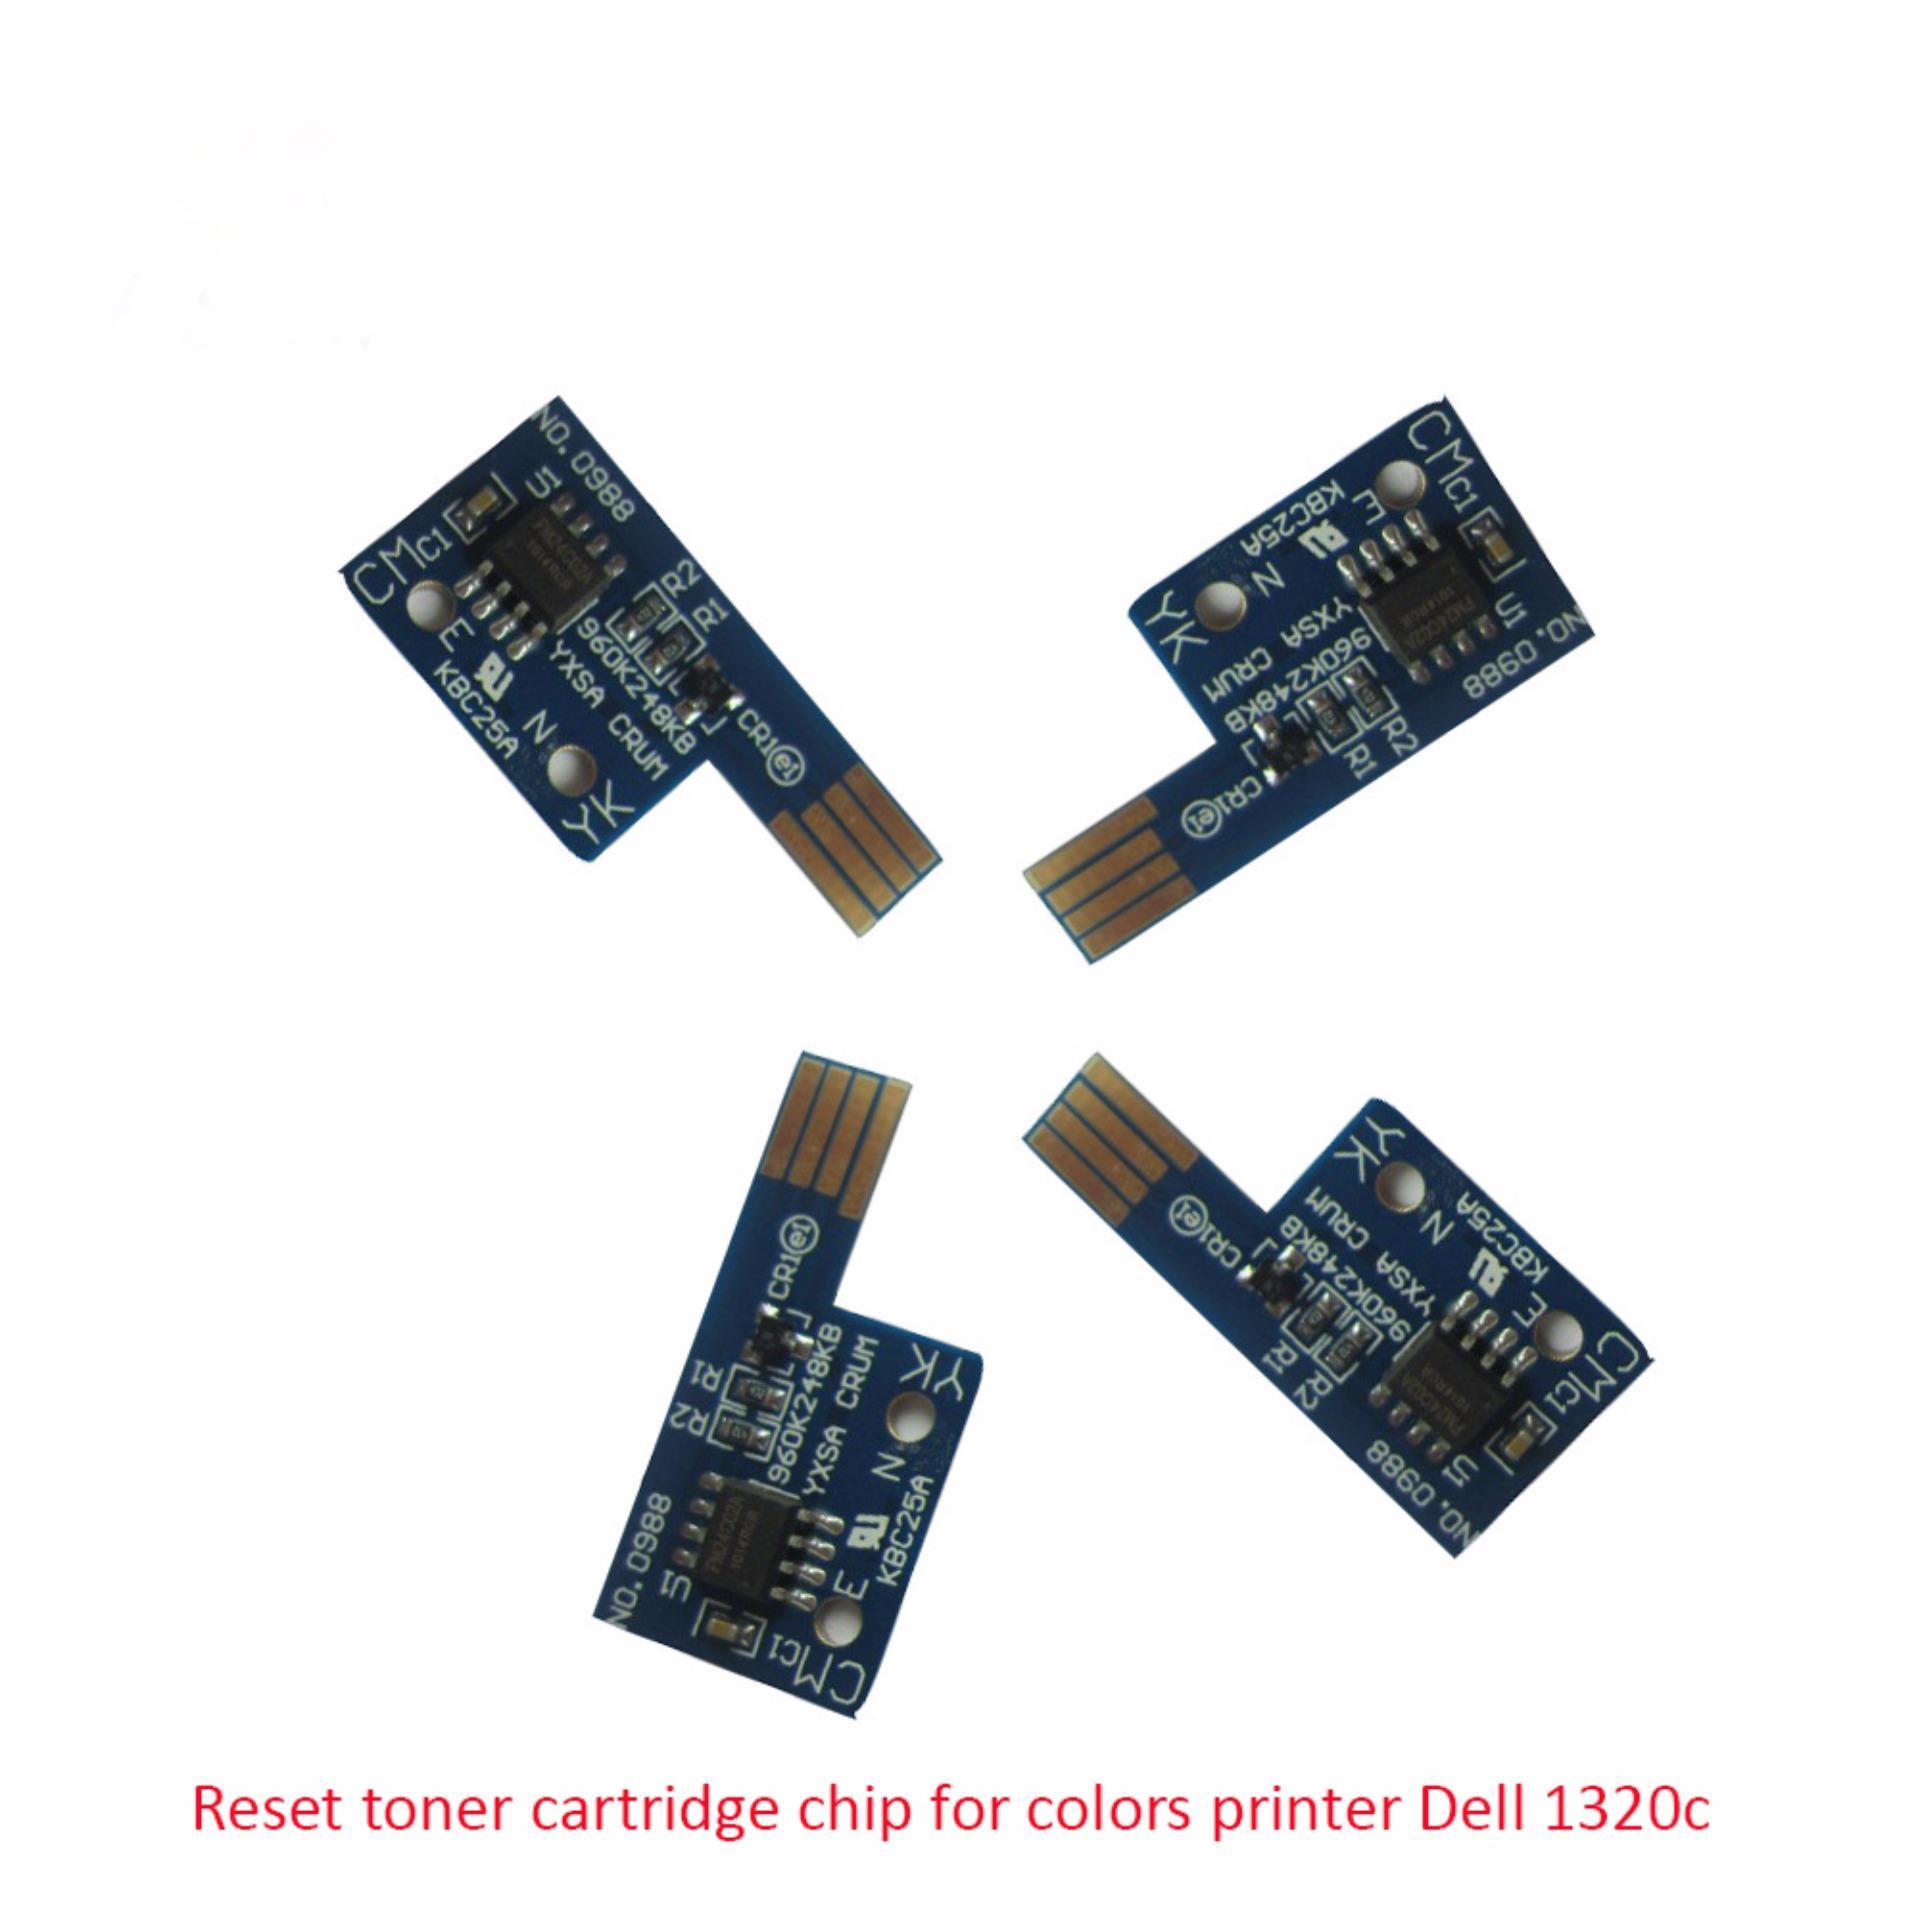 toner chip reset printer Dell 1320c